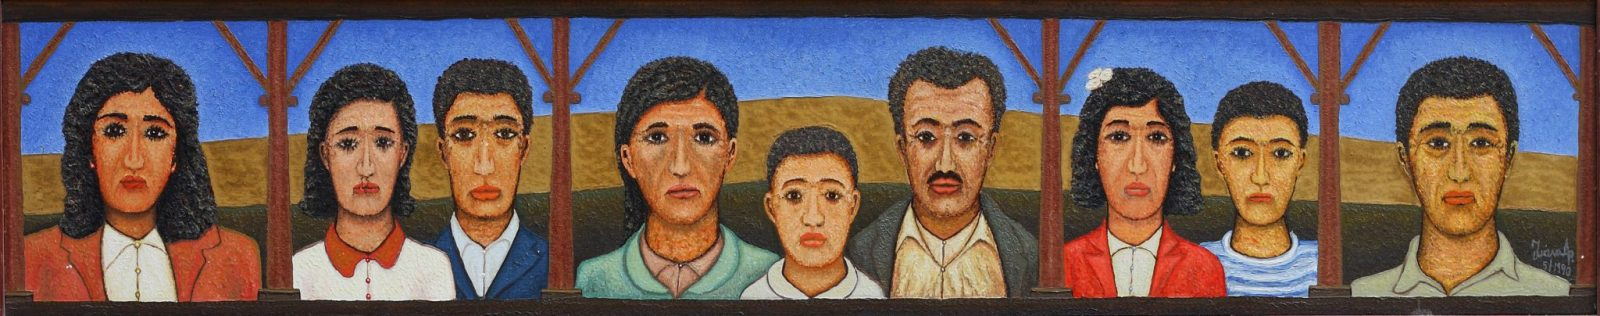 Aris Ioannou Collection 135